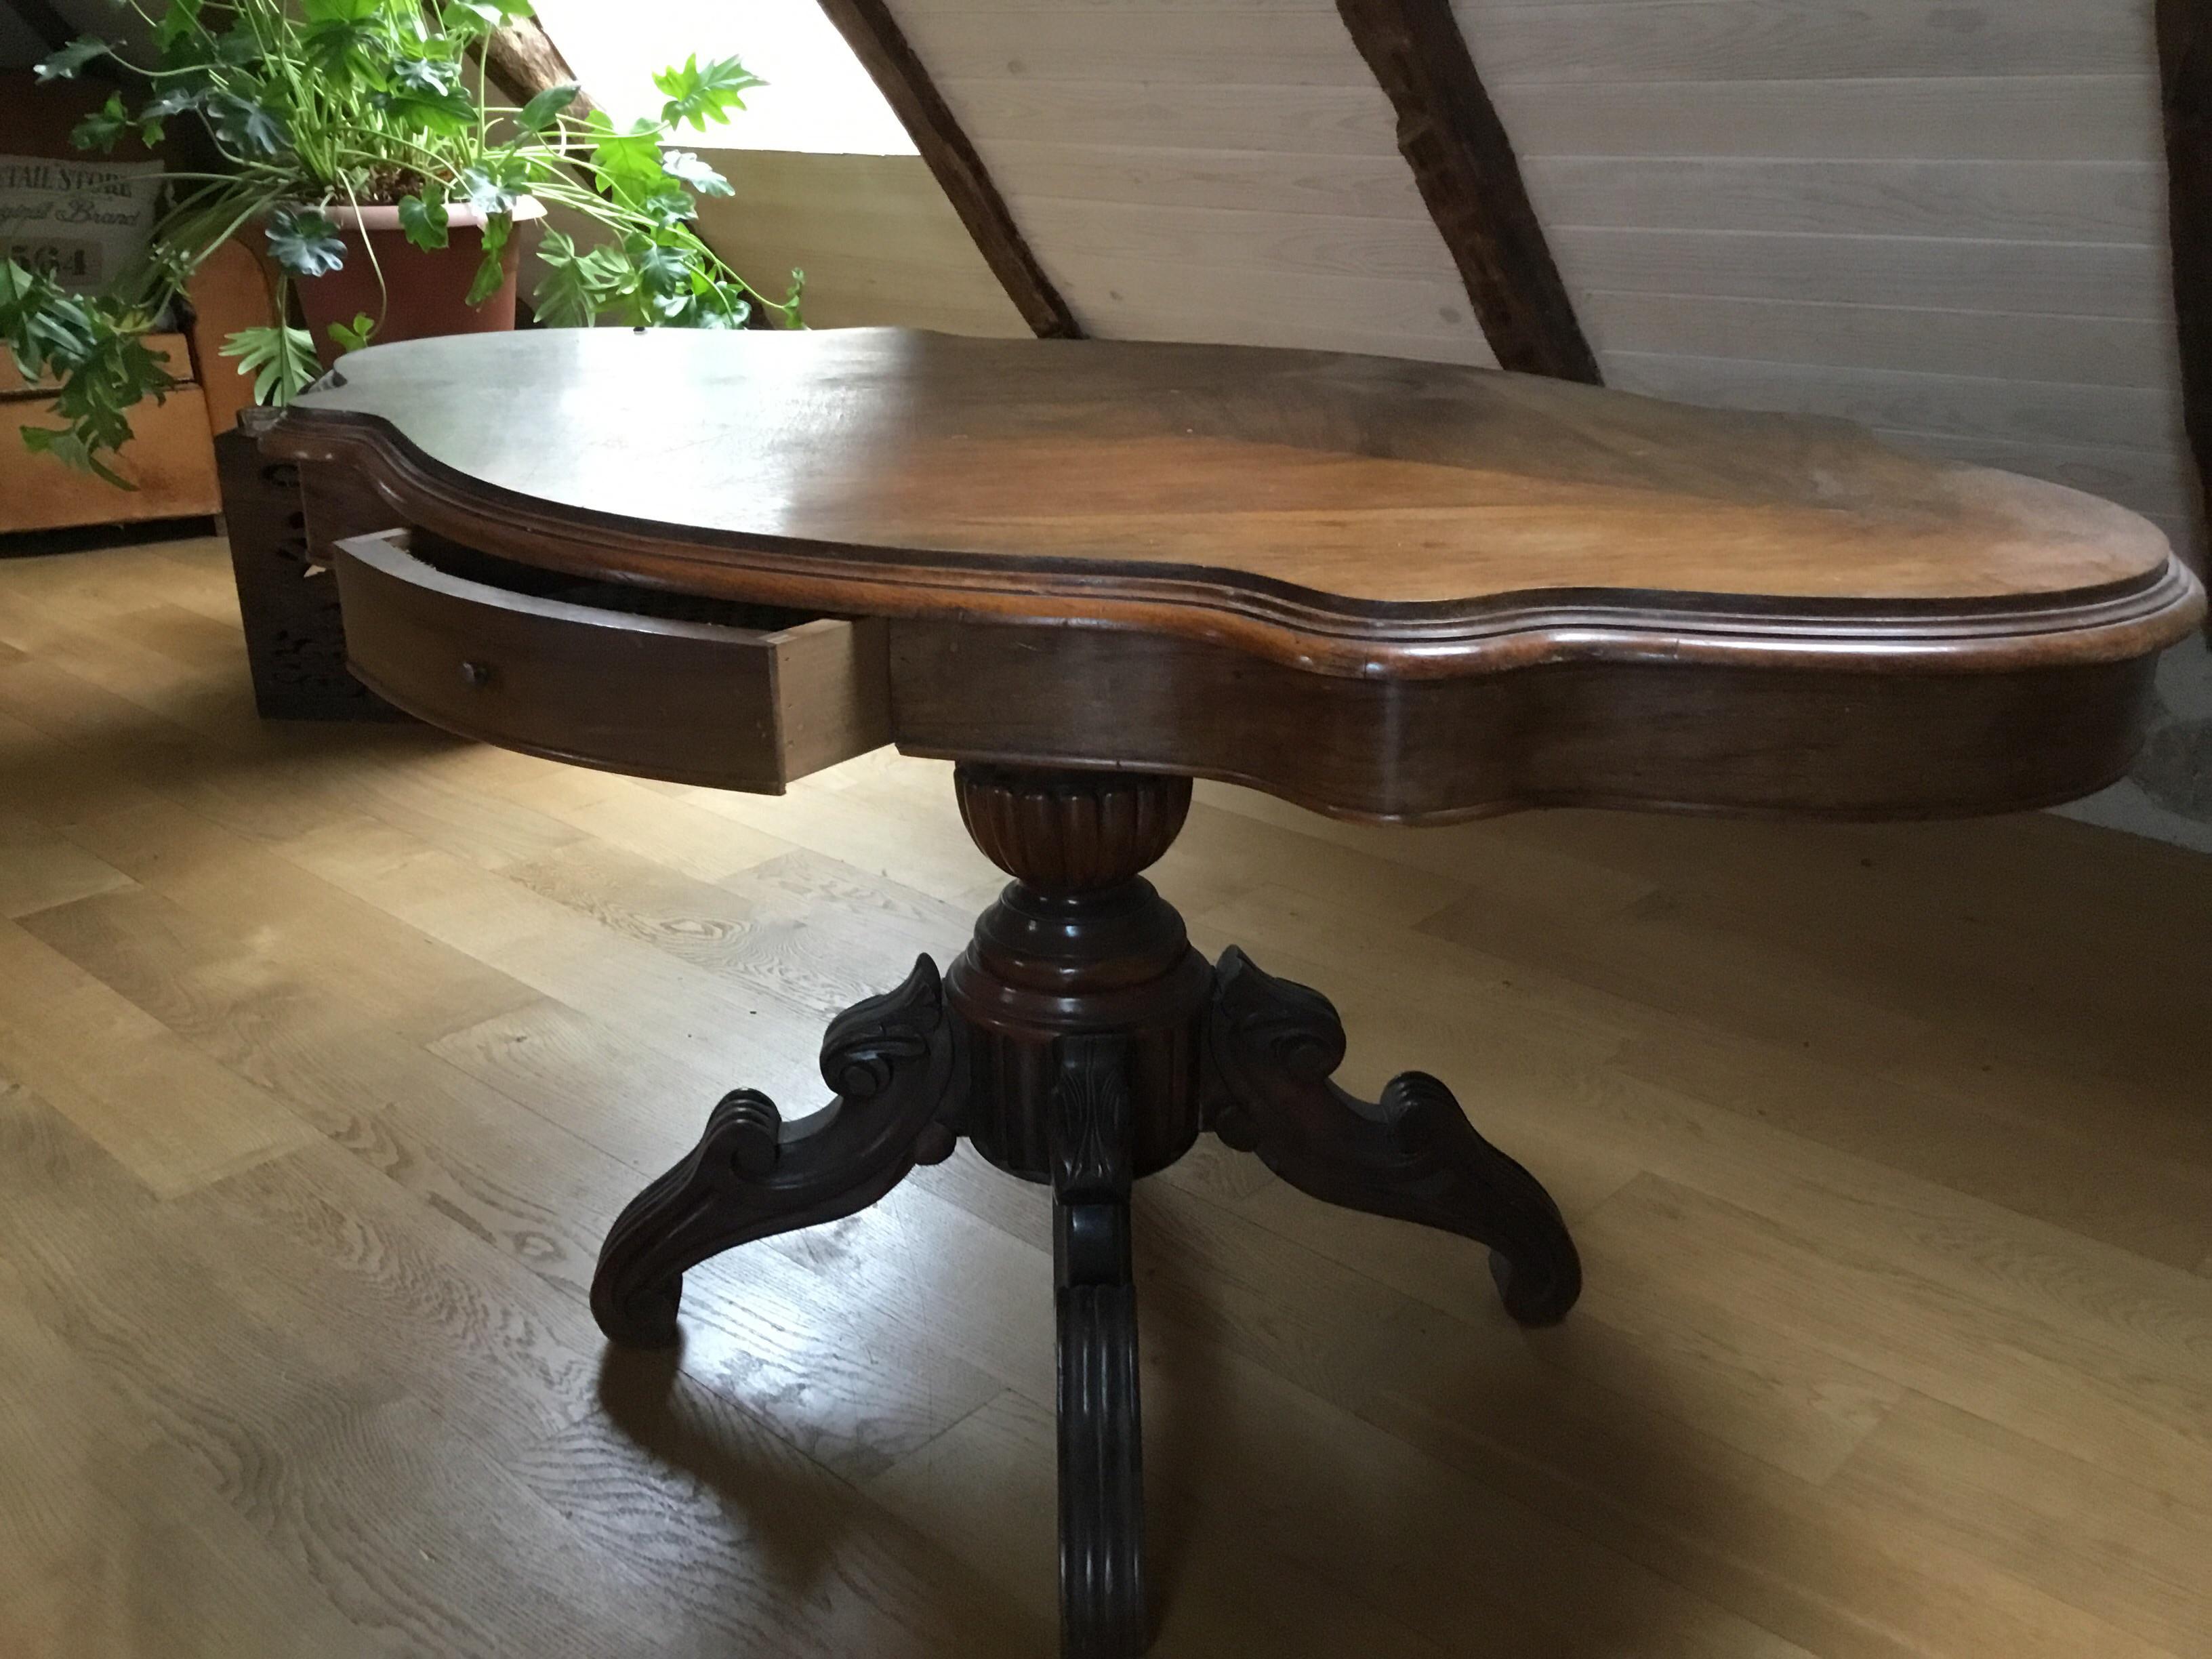 Philippe Violon Louis Violon Table Table Louis PiukXZTwO